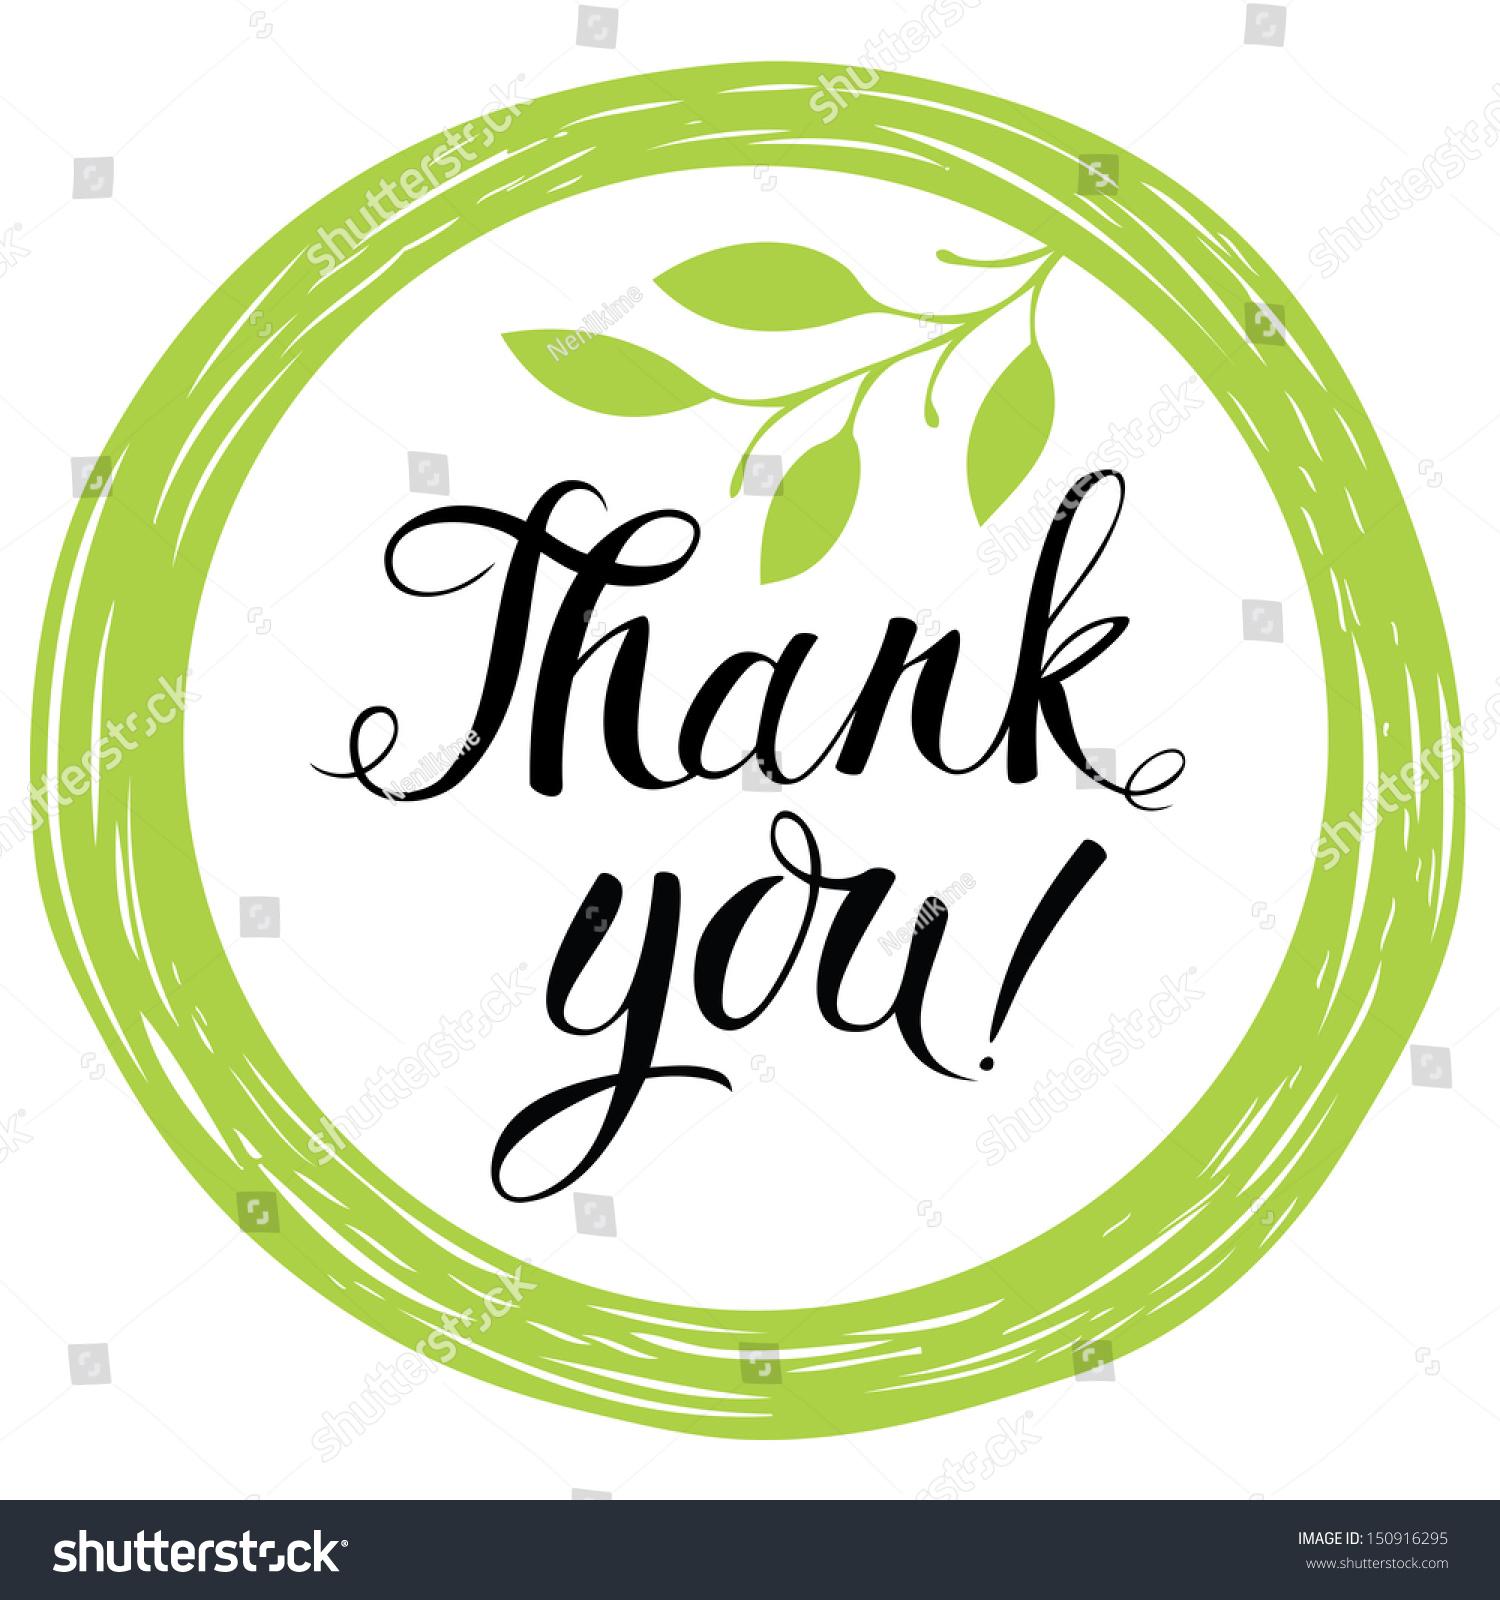 thank you card stock vector shutterstock thank you card